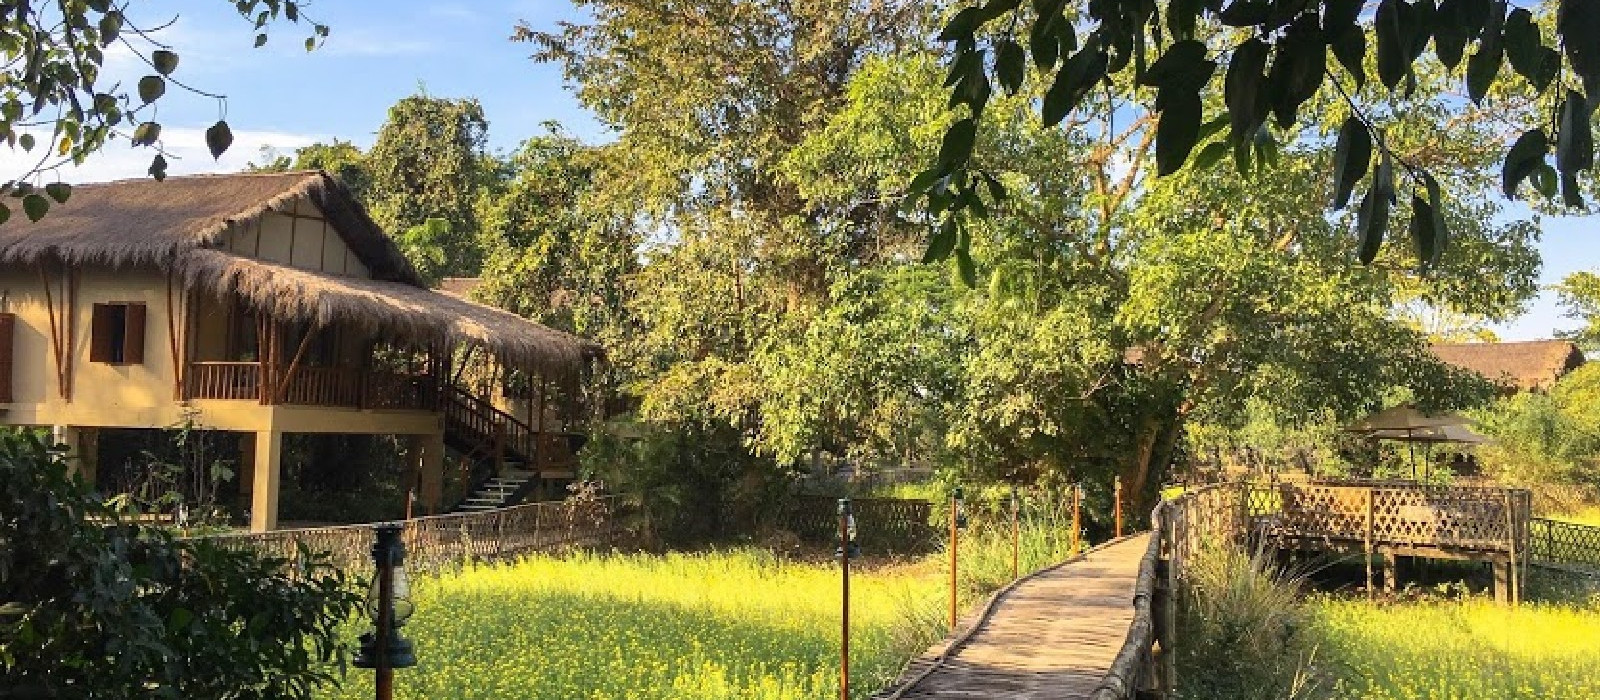 Hotel Diphlu River Lodge Ostindien